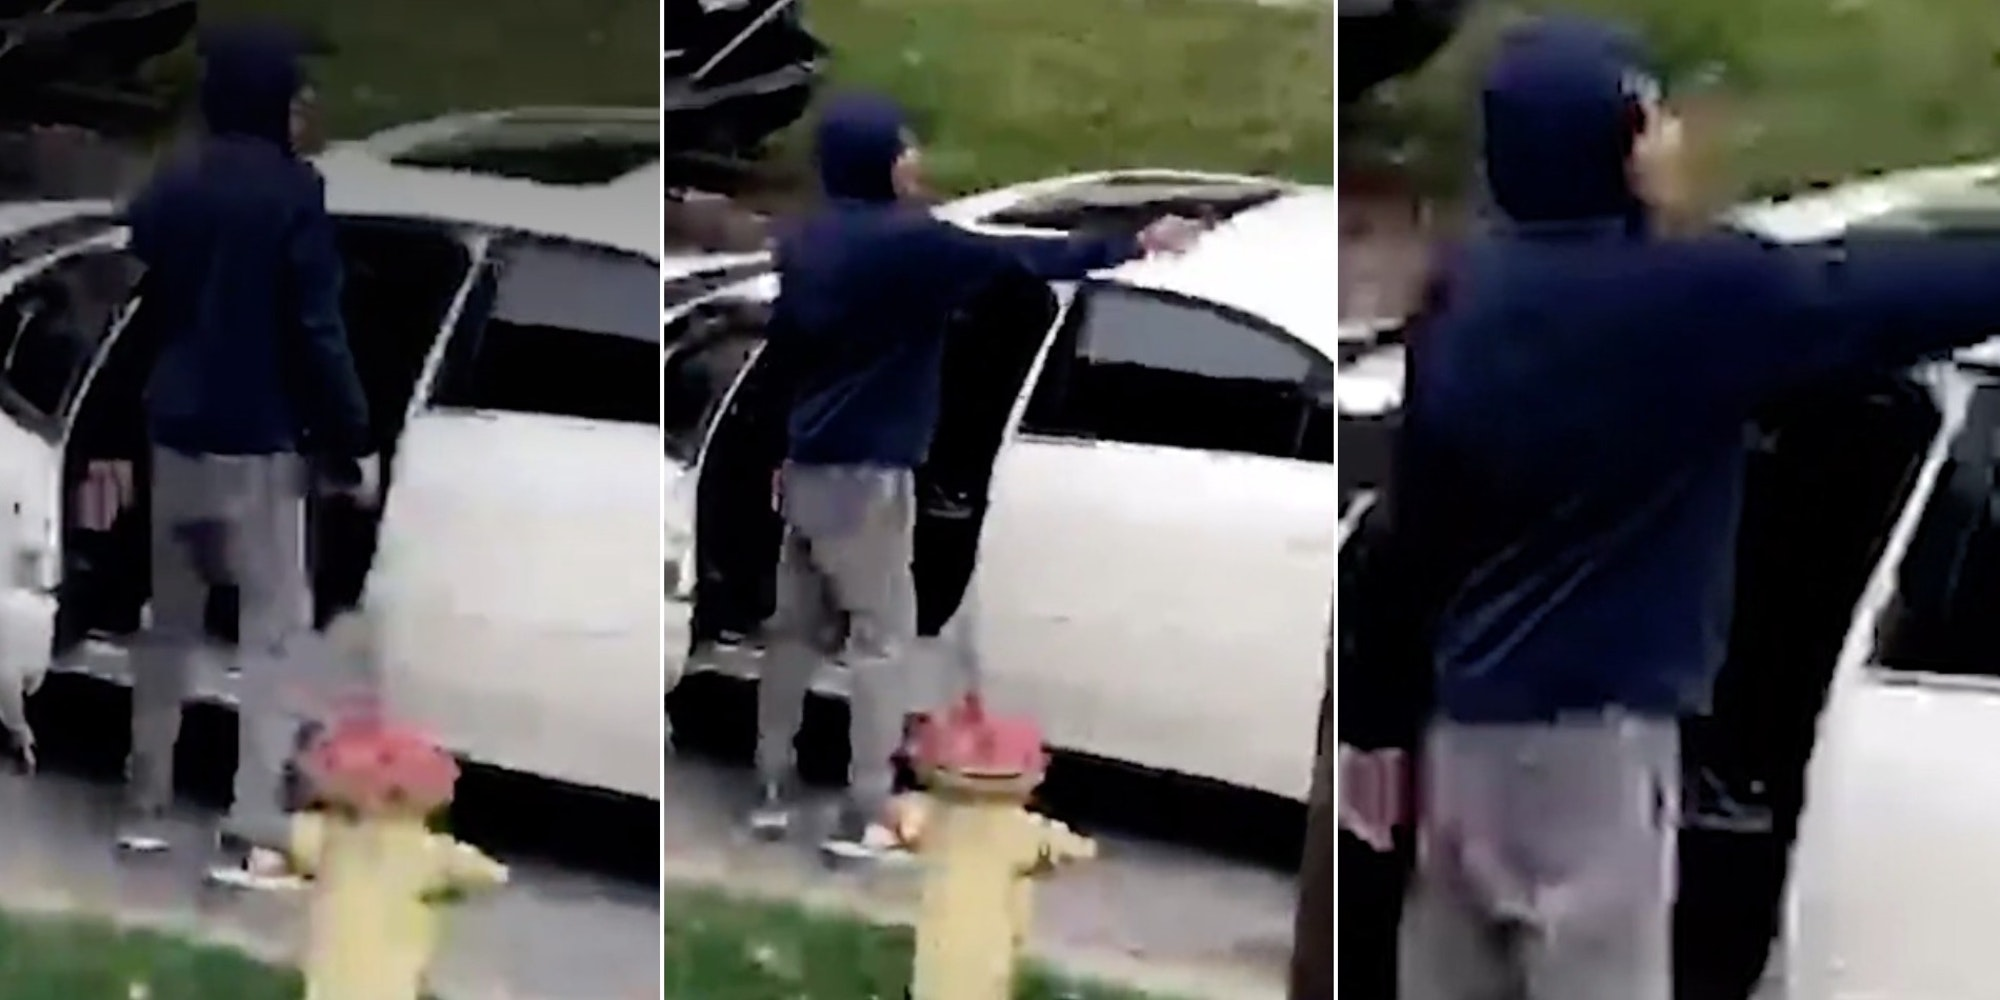 Man fires gun at teens playing basketball